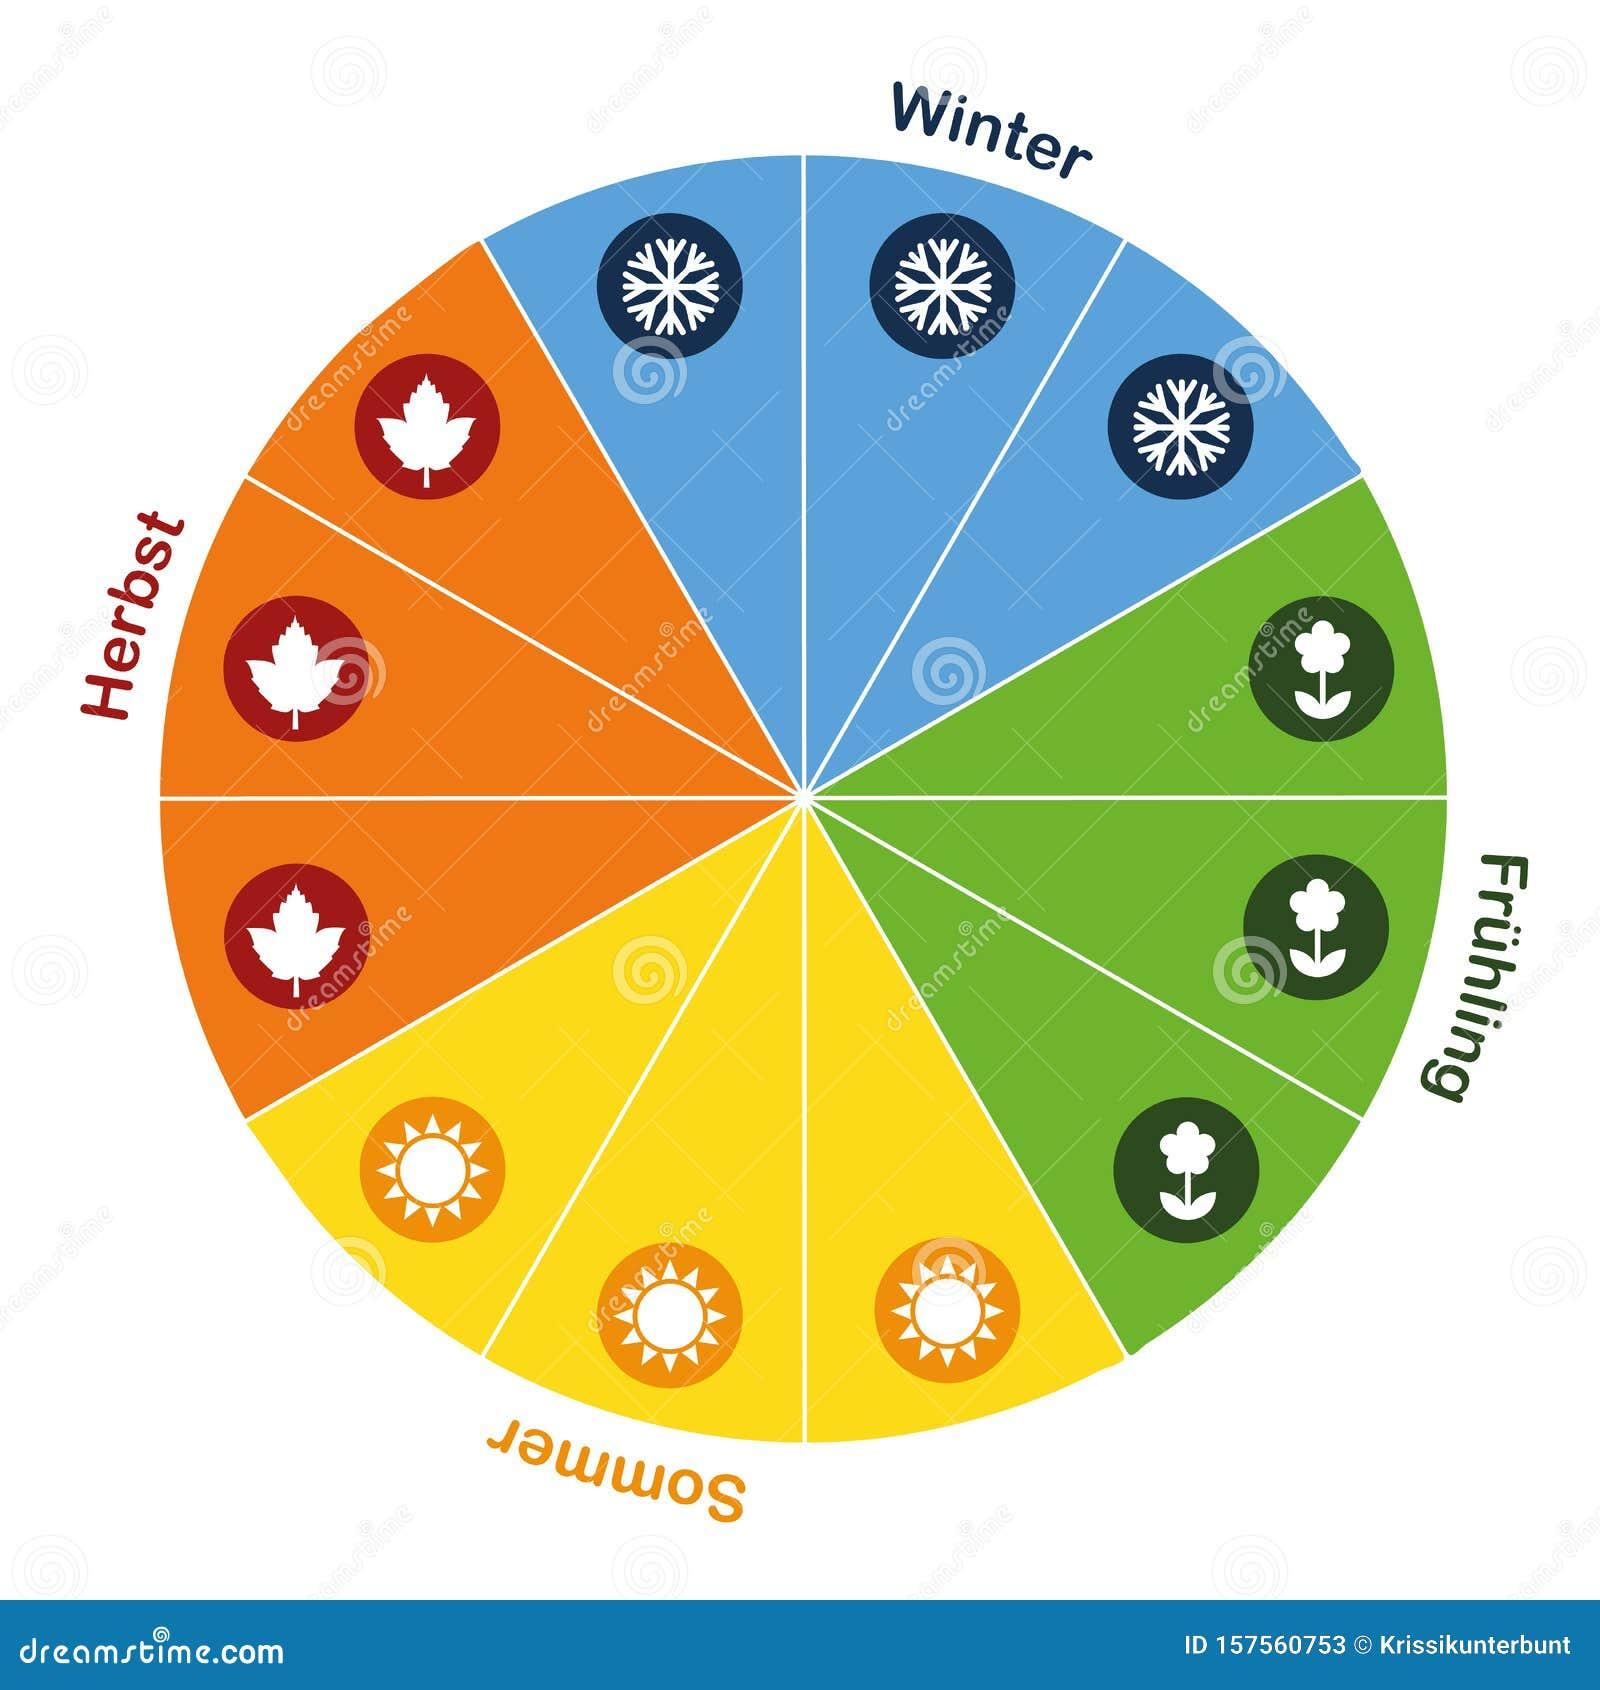 four seasons circle stock illustrations  330 four seasons